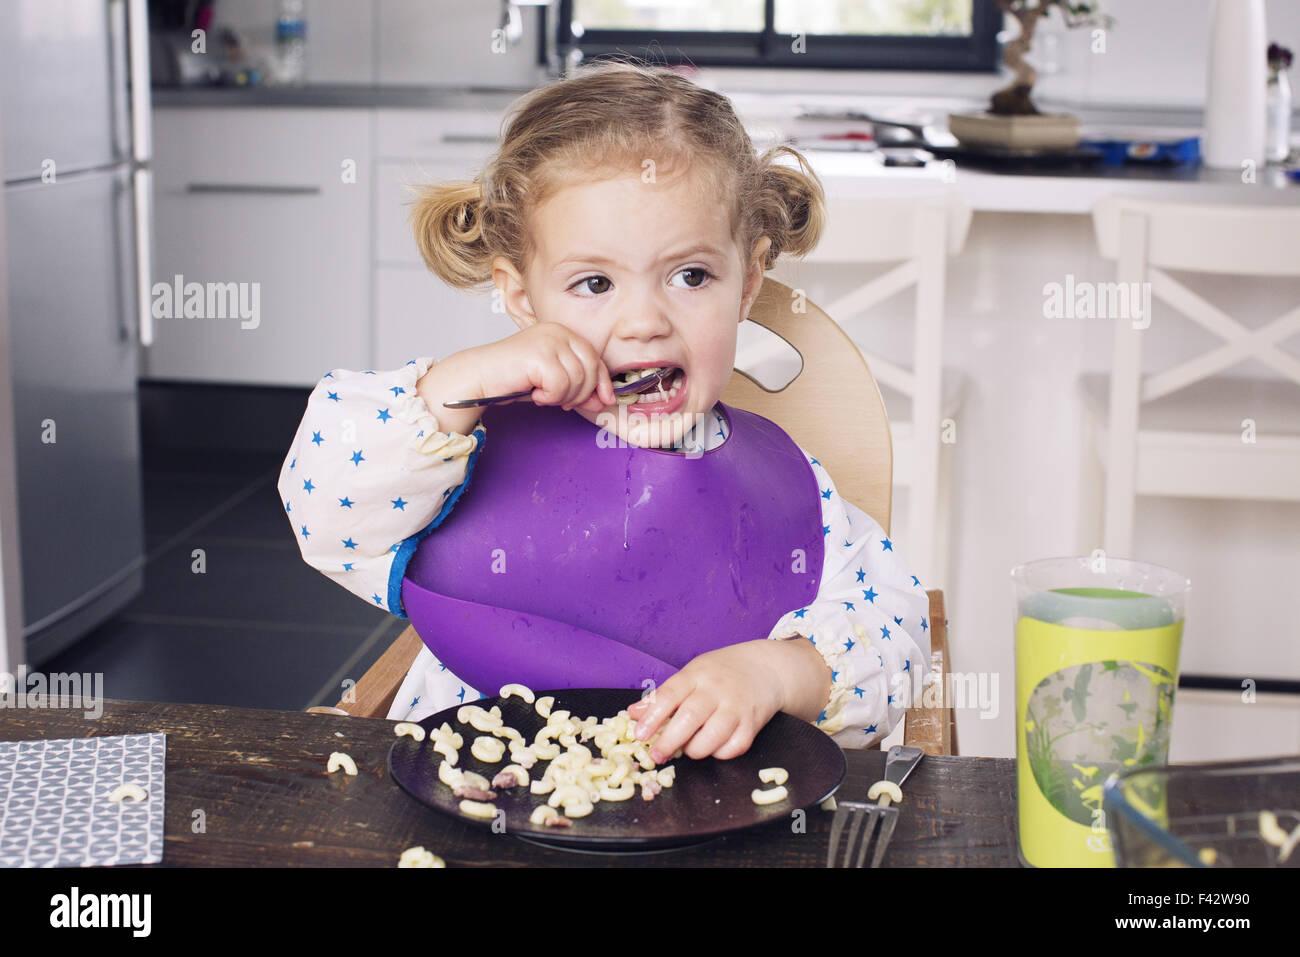 Little girl eating lunch - Stock Image